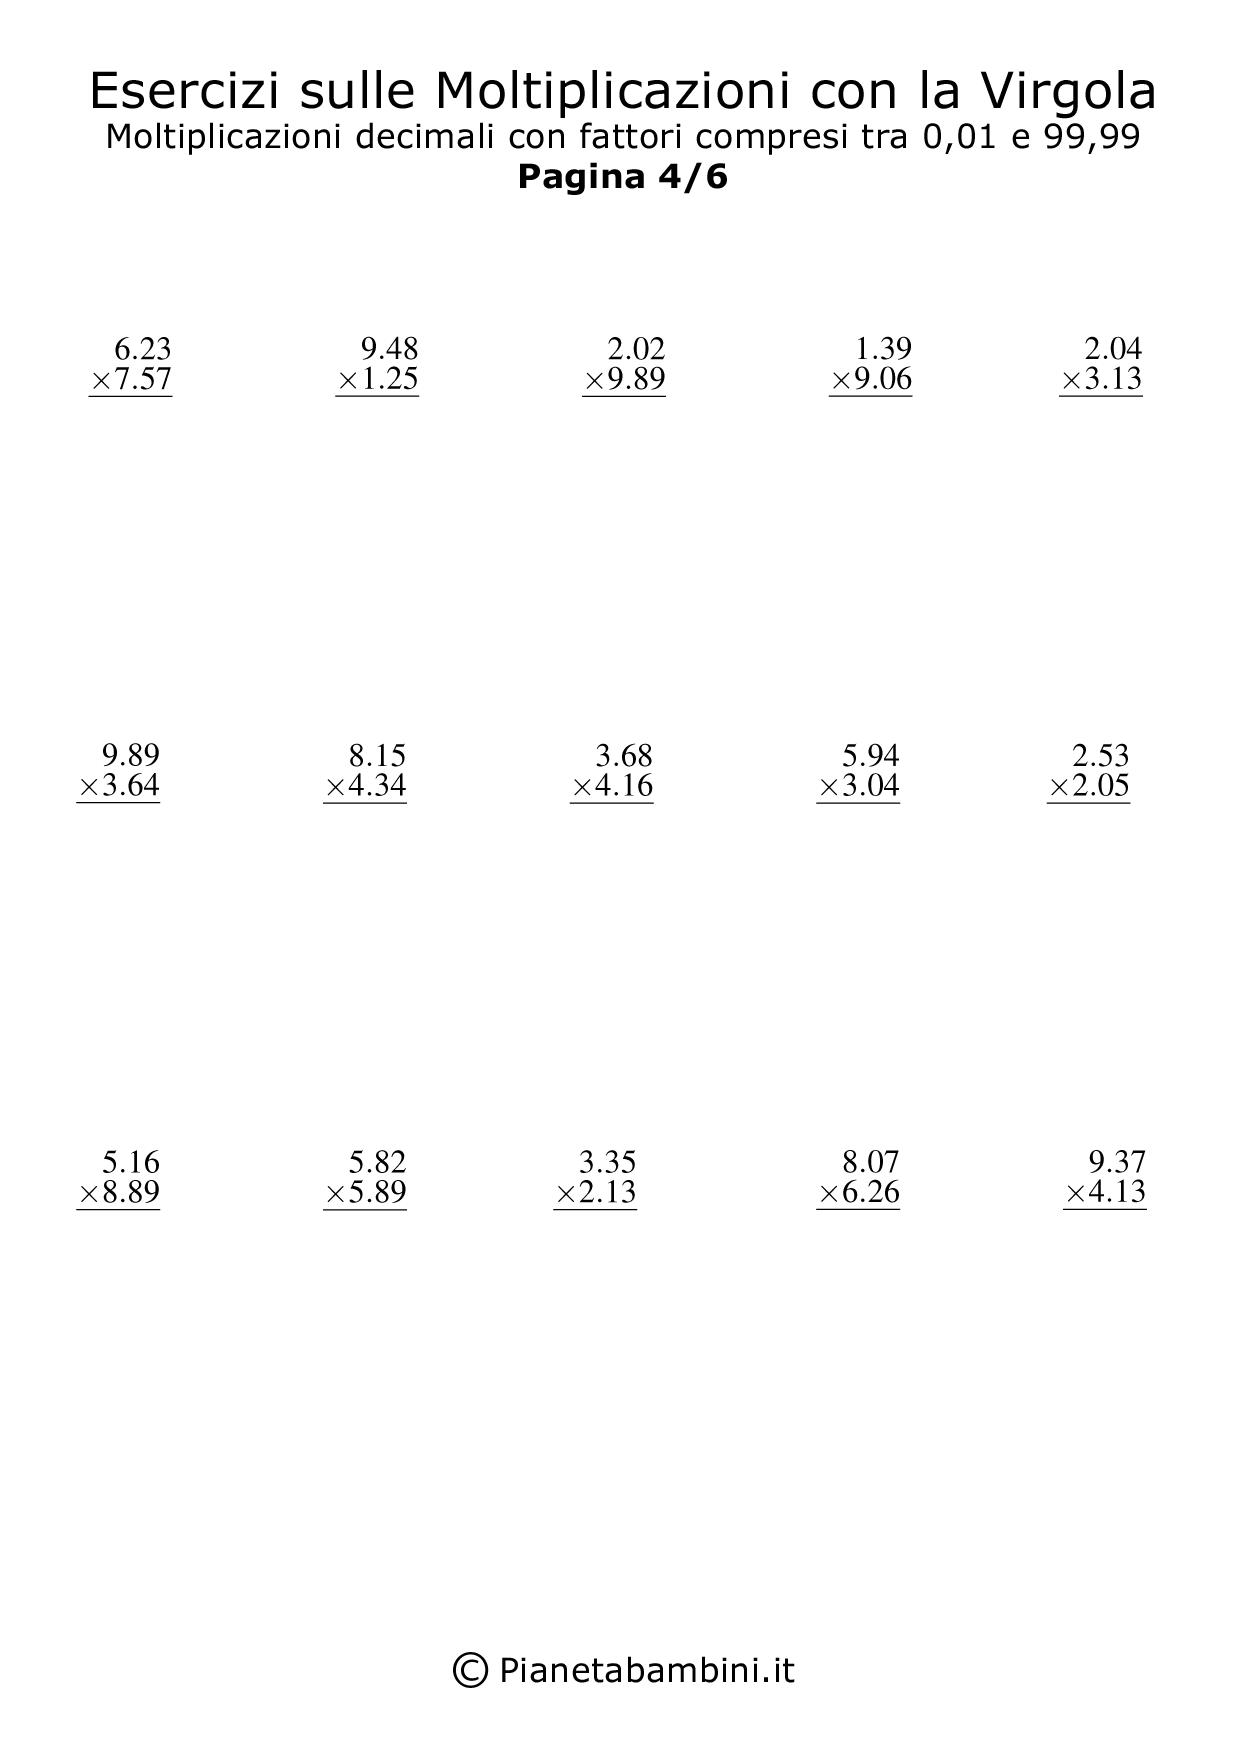 Moltiplicazioni-Virgola-0.01-99.99_4